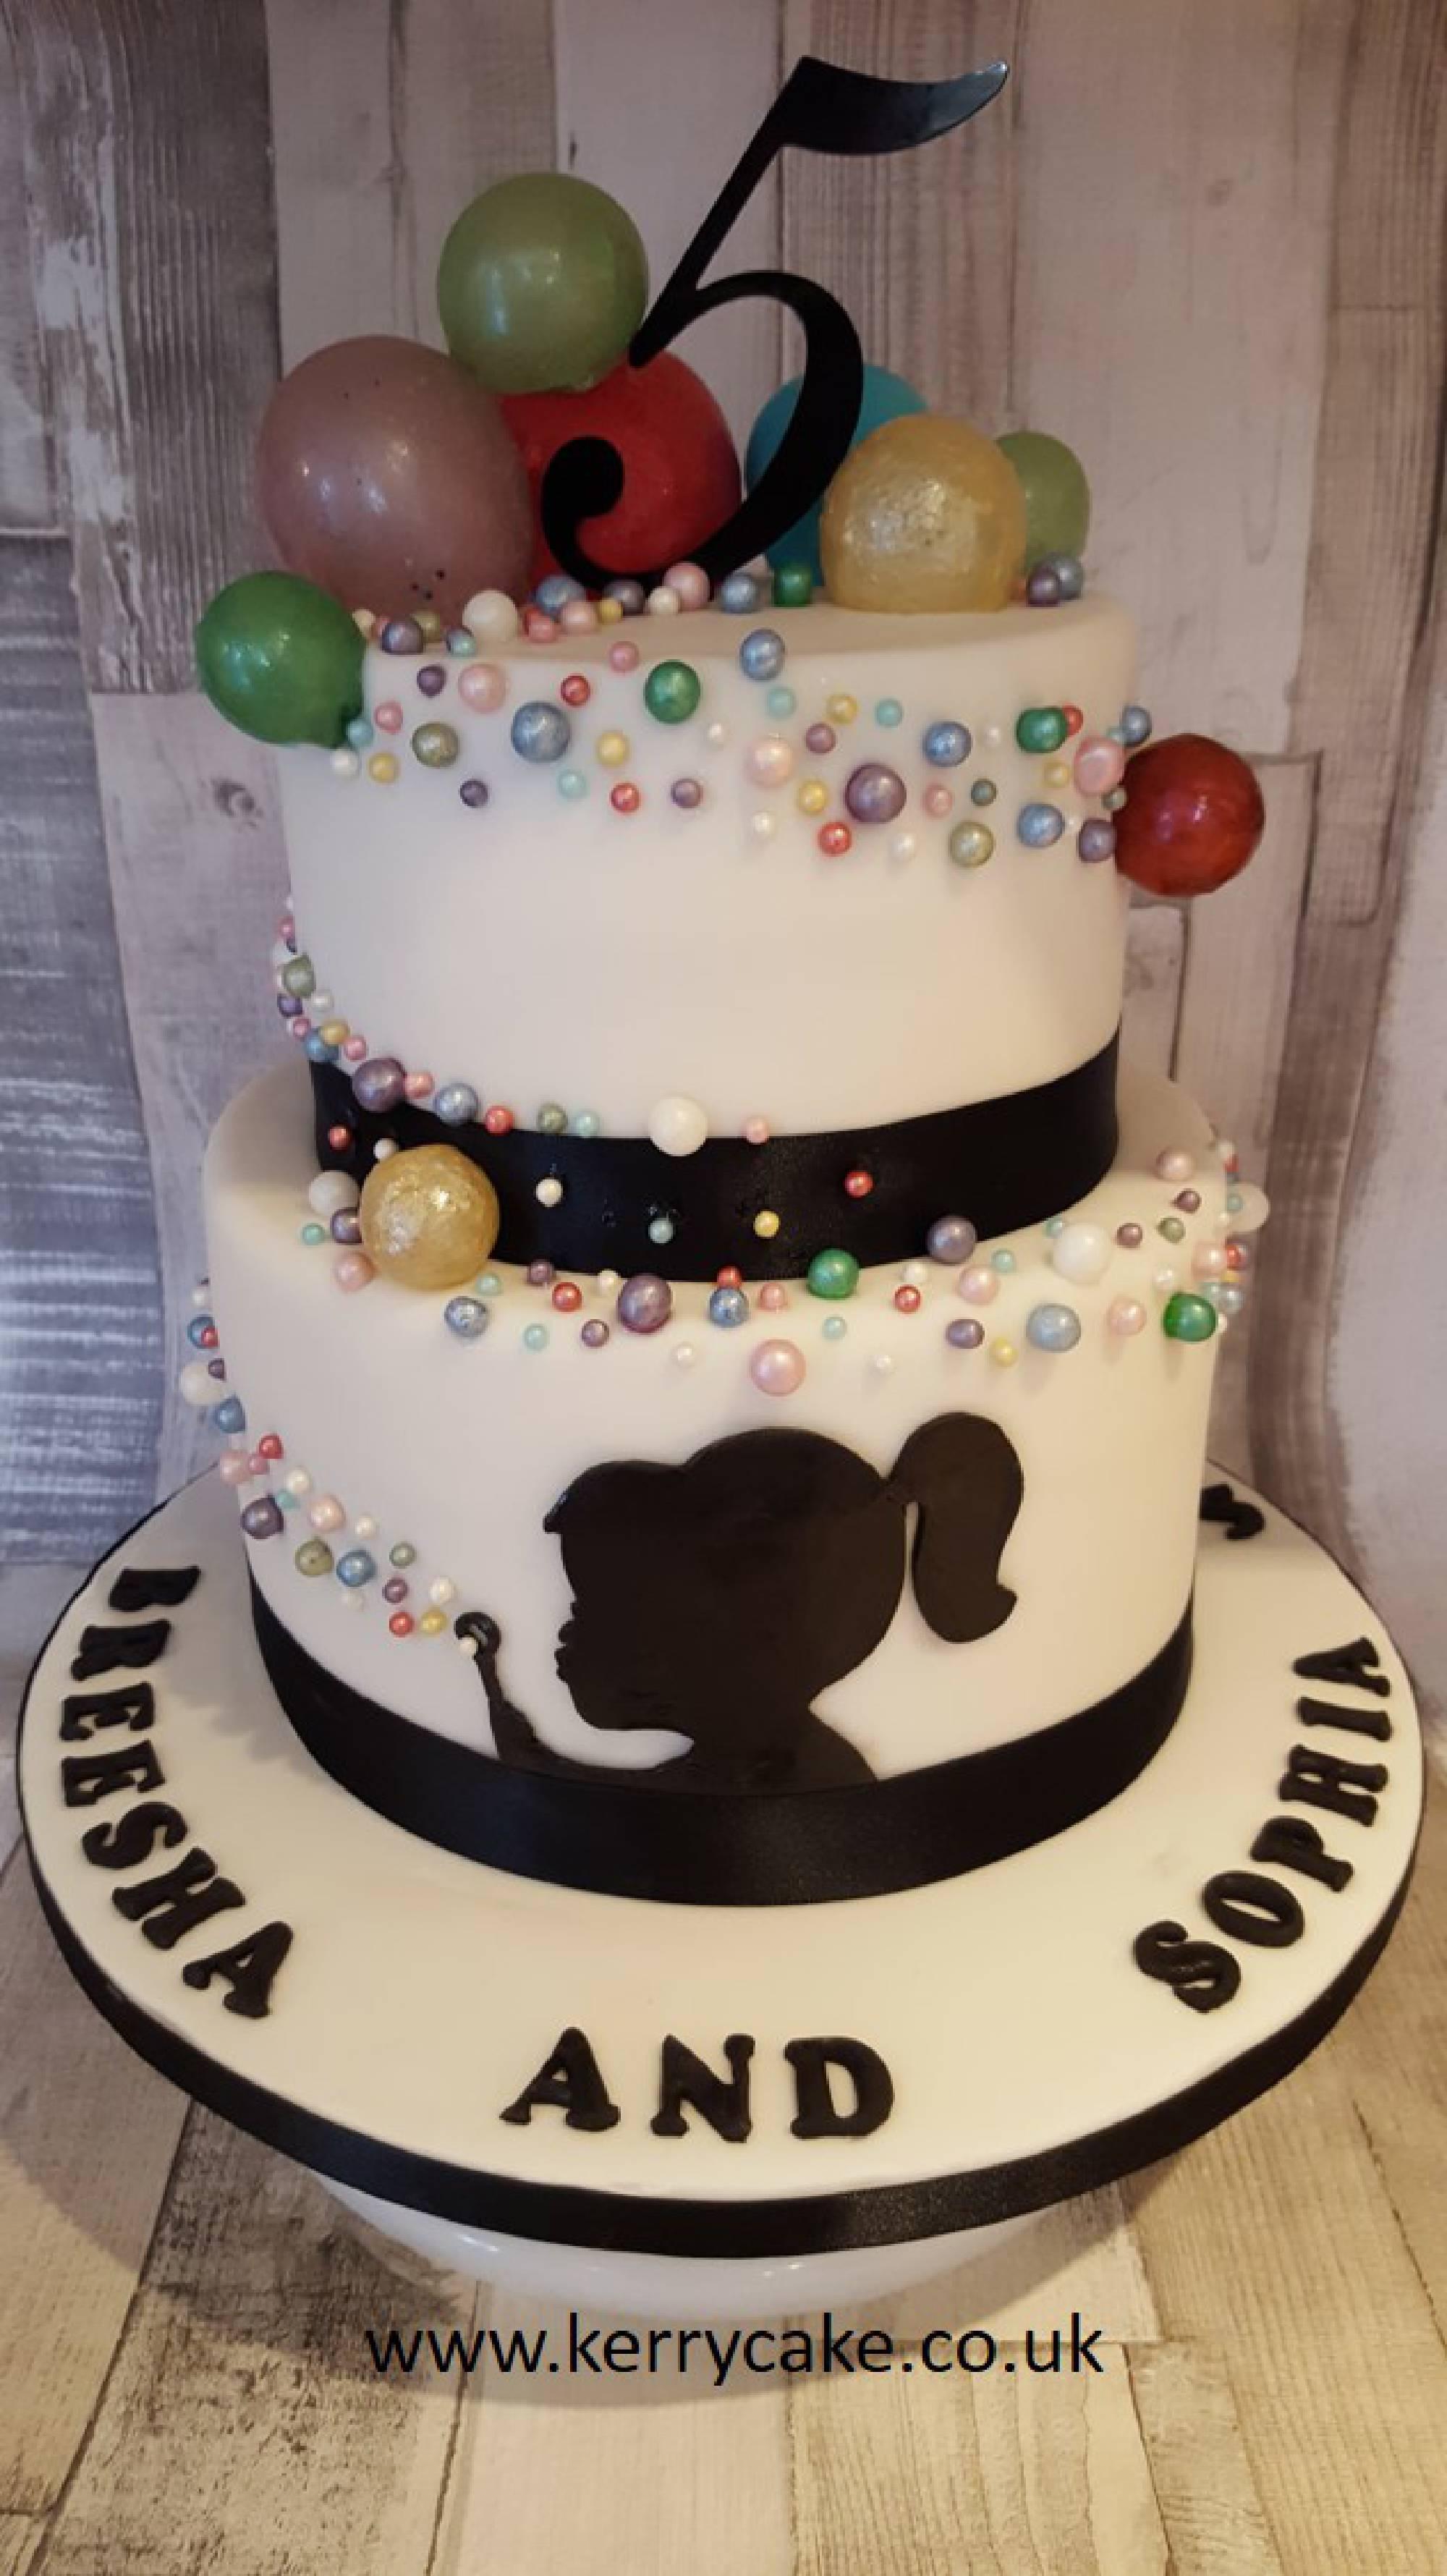 Kerrycake Birthday Cakes Classic Cakeshome Baked Celebration